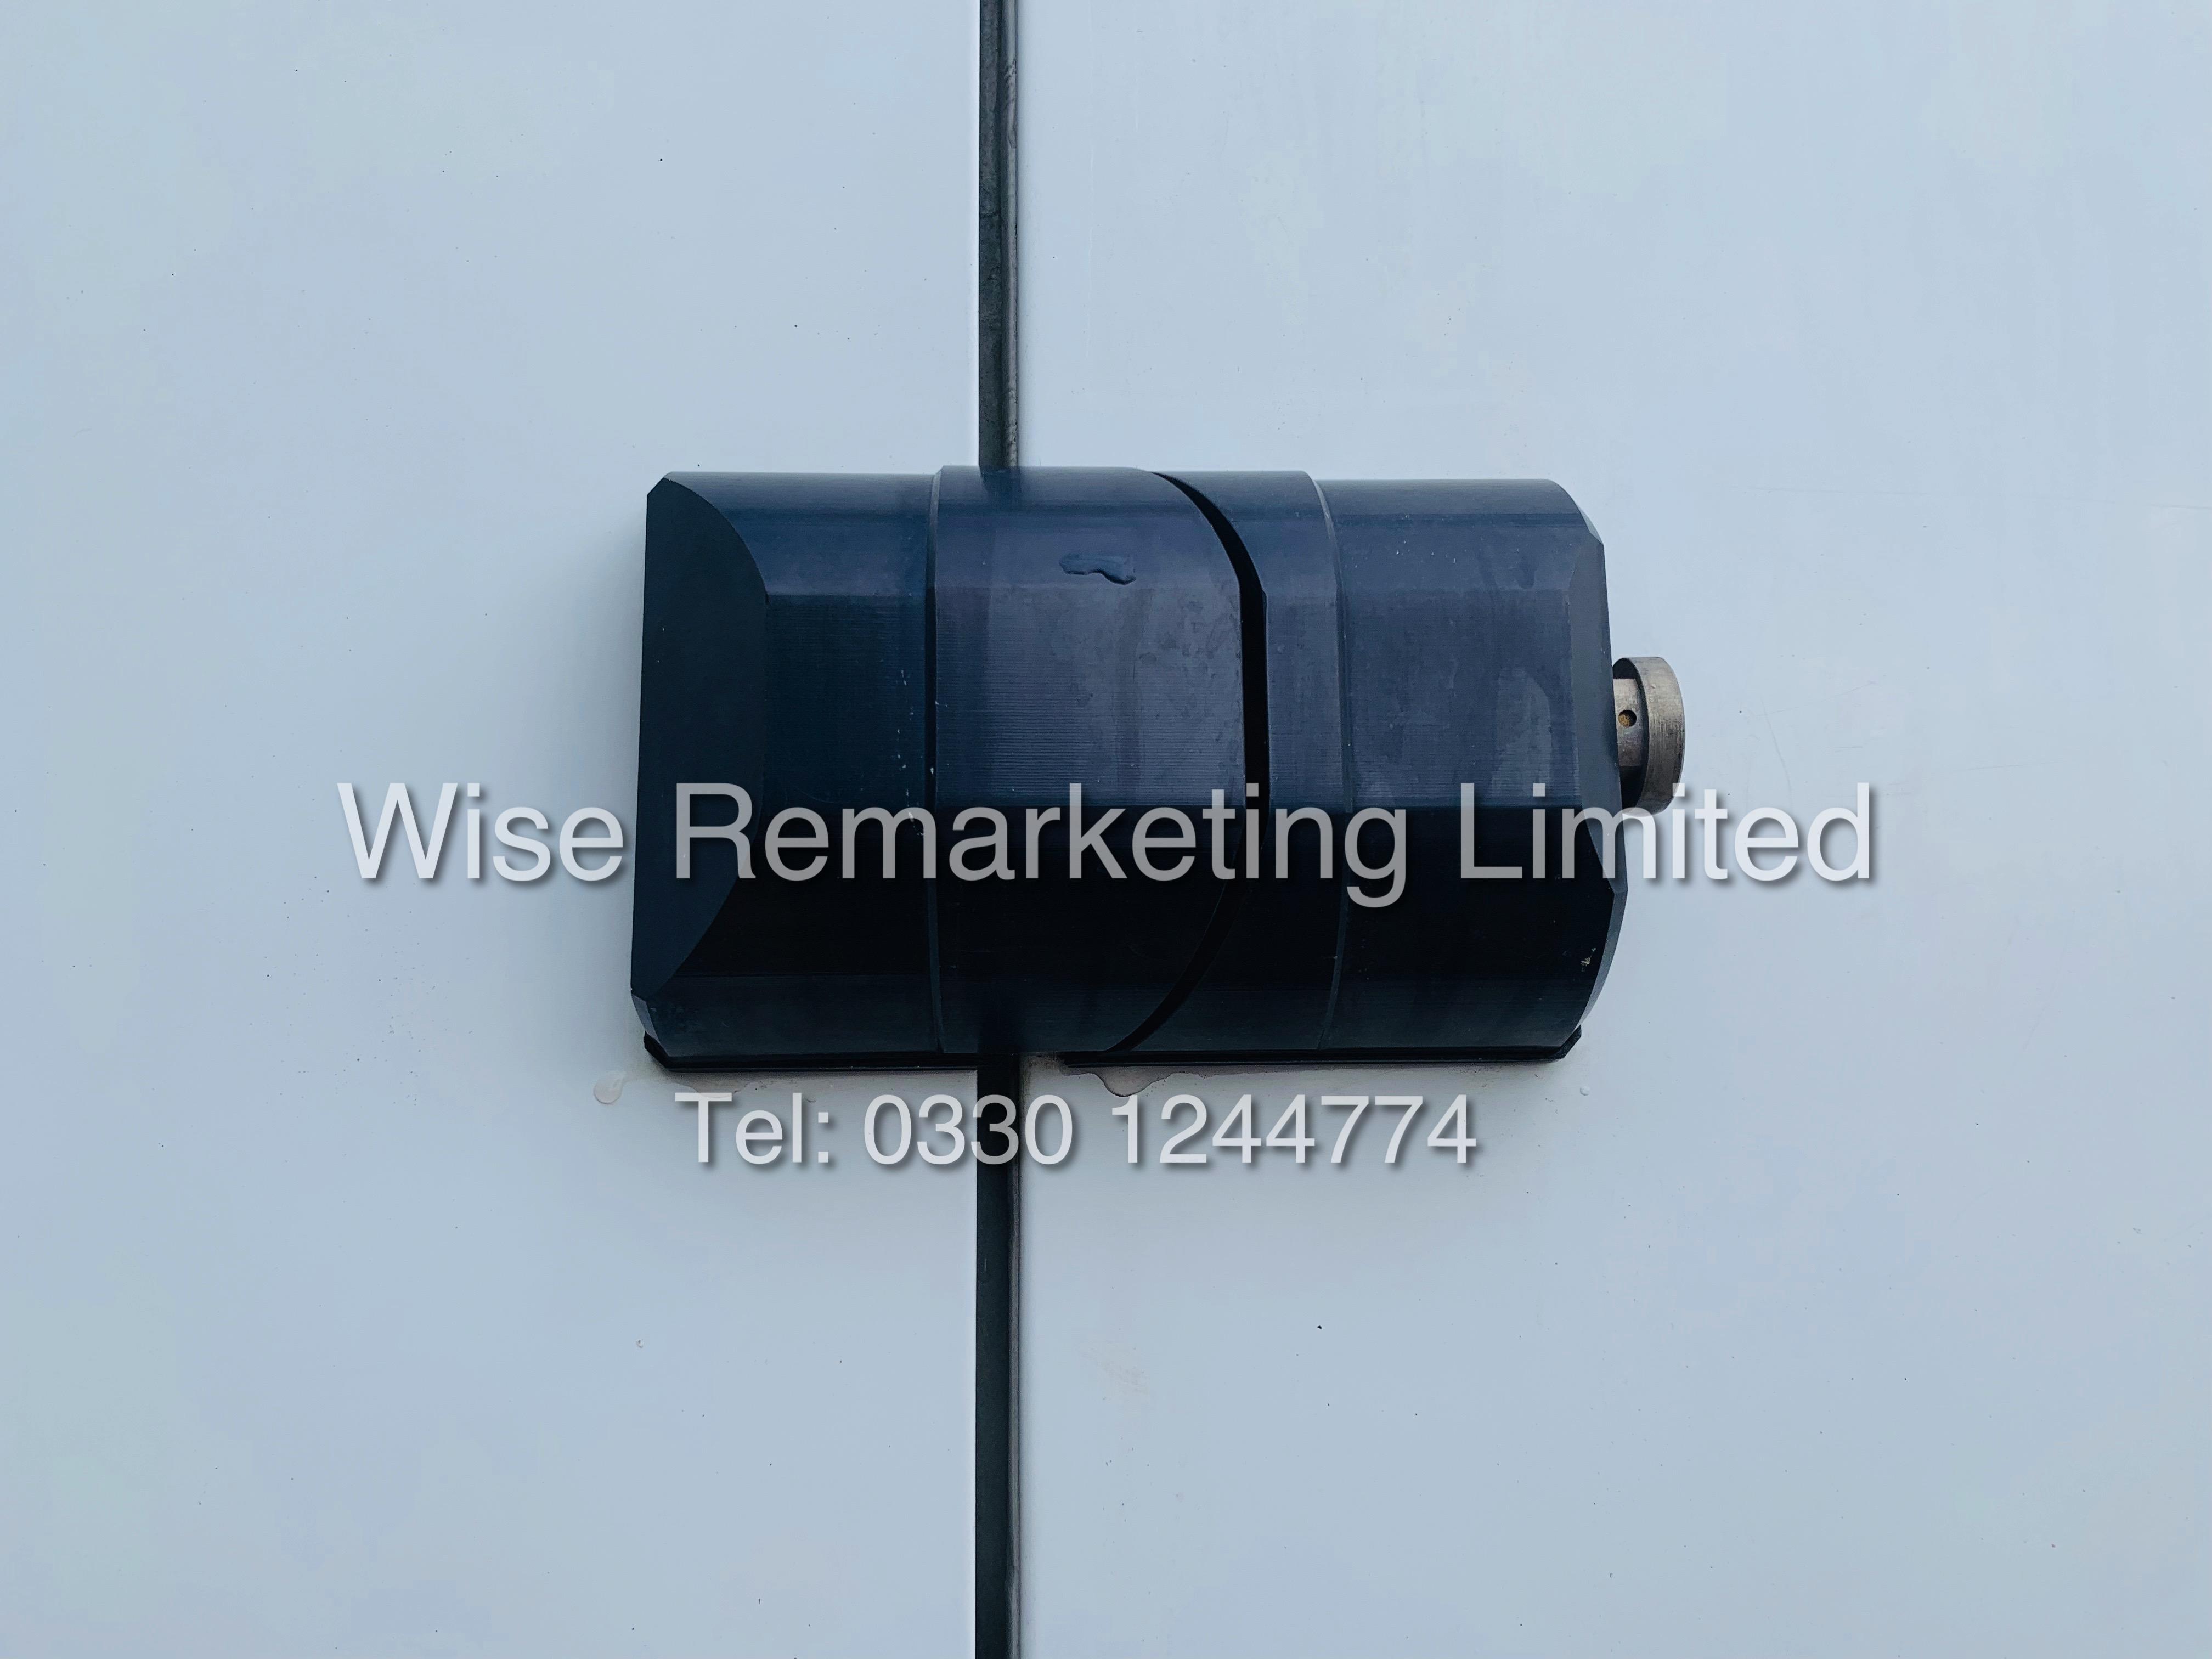 Lot 6 - **RESERVE MET** FORD TRANSIT T350 115 2.2 TDCI LWB 2011 *1 COMPANY OWNER*